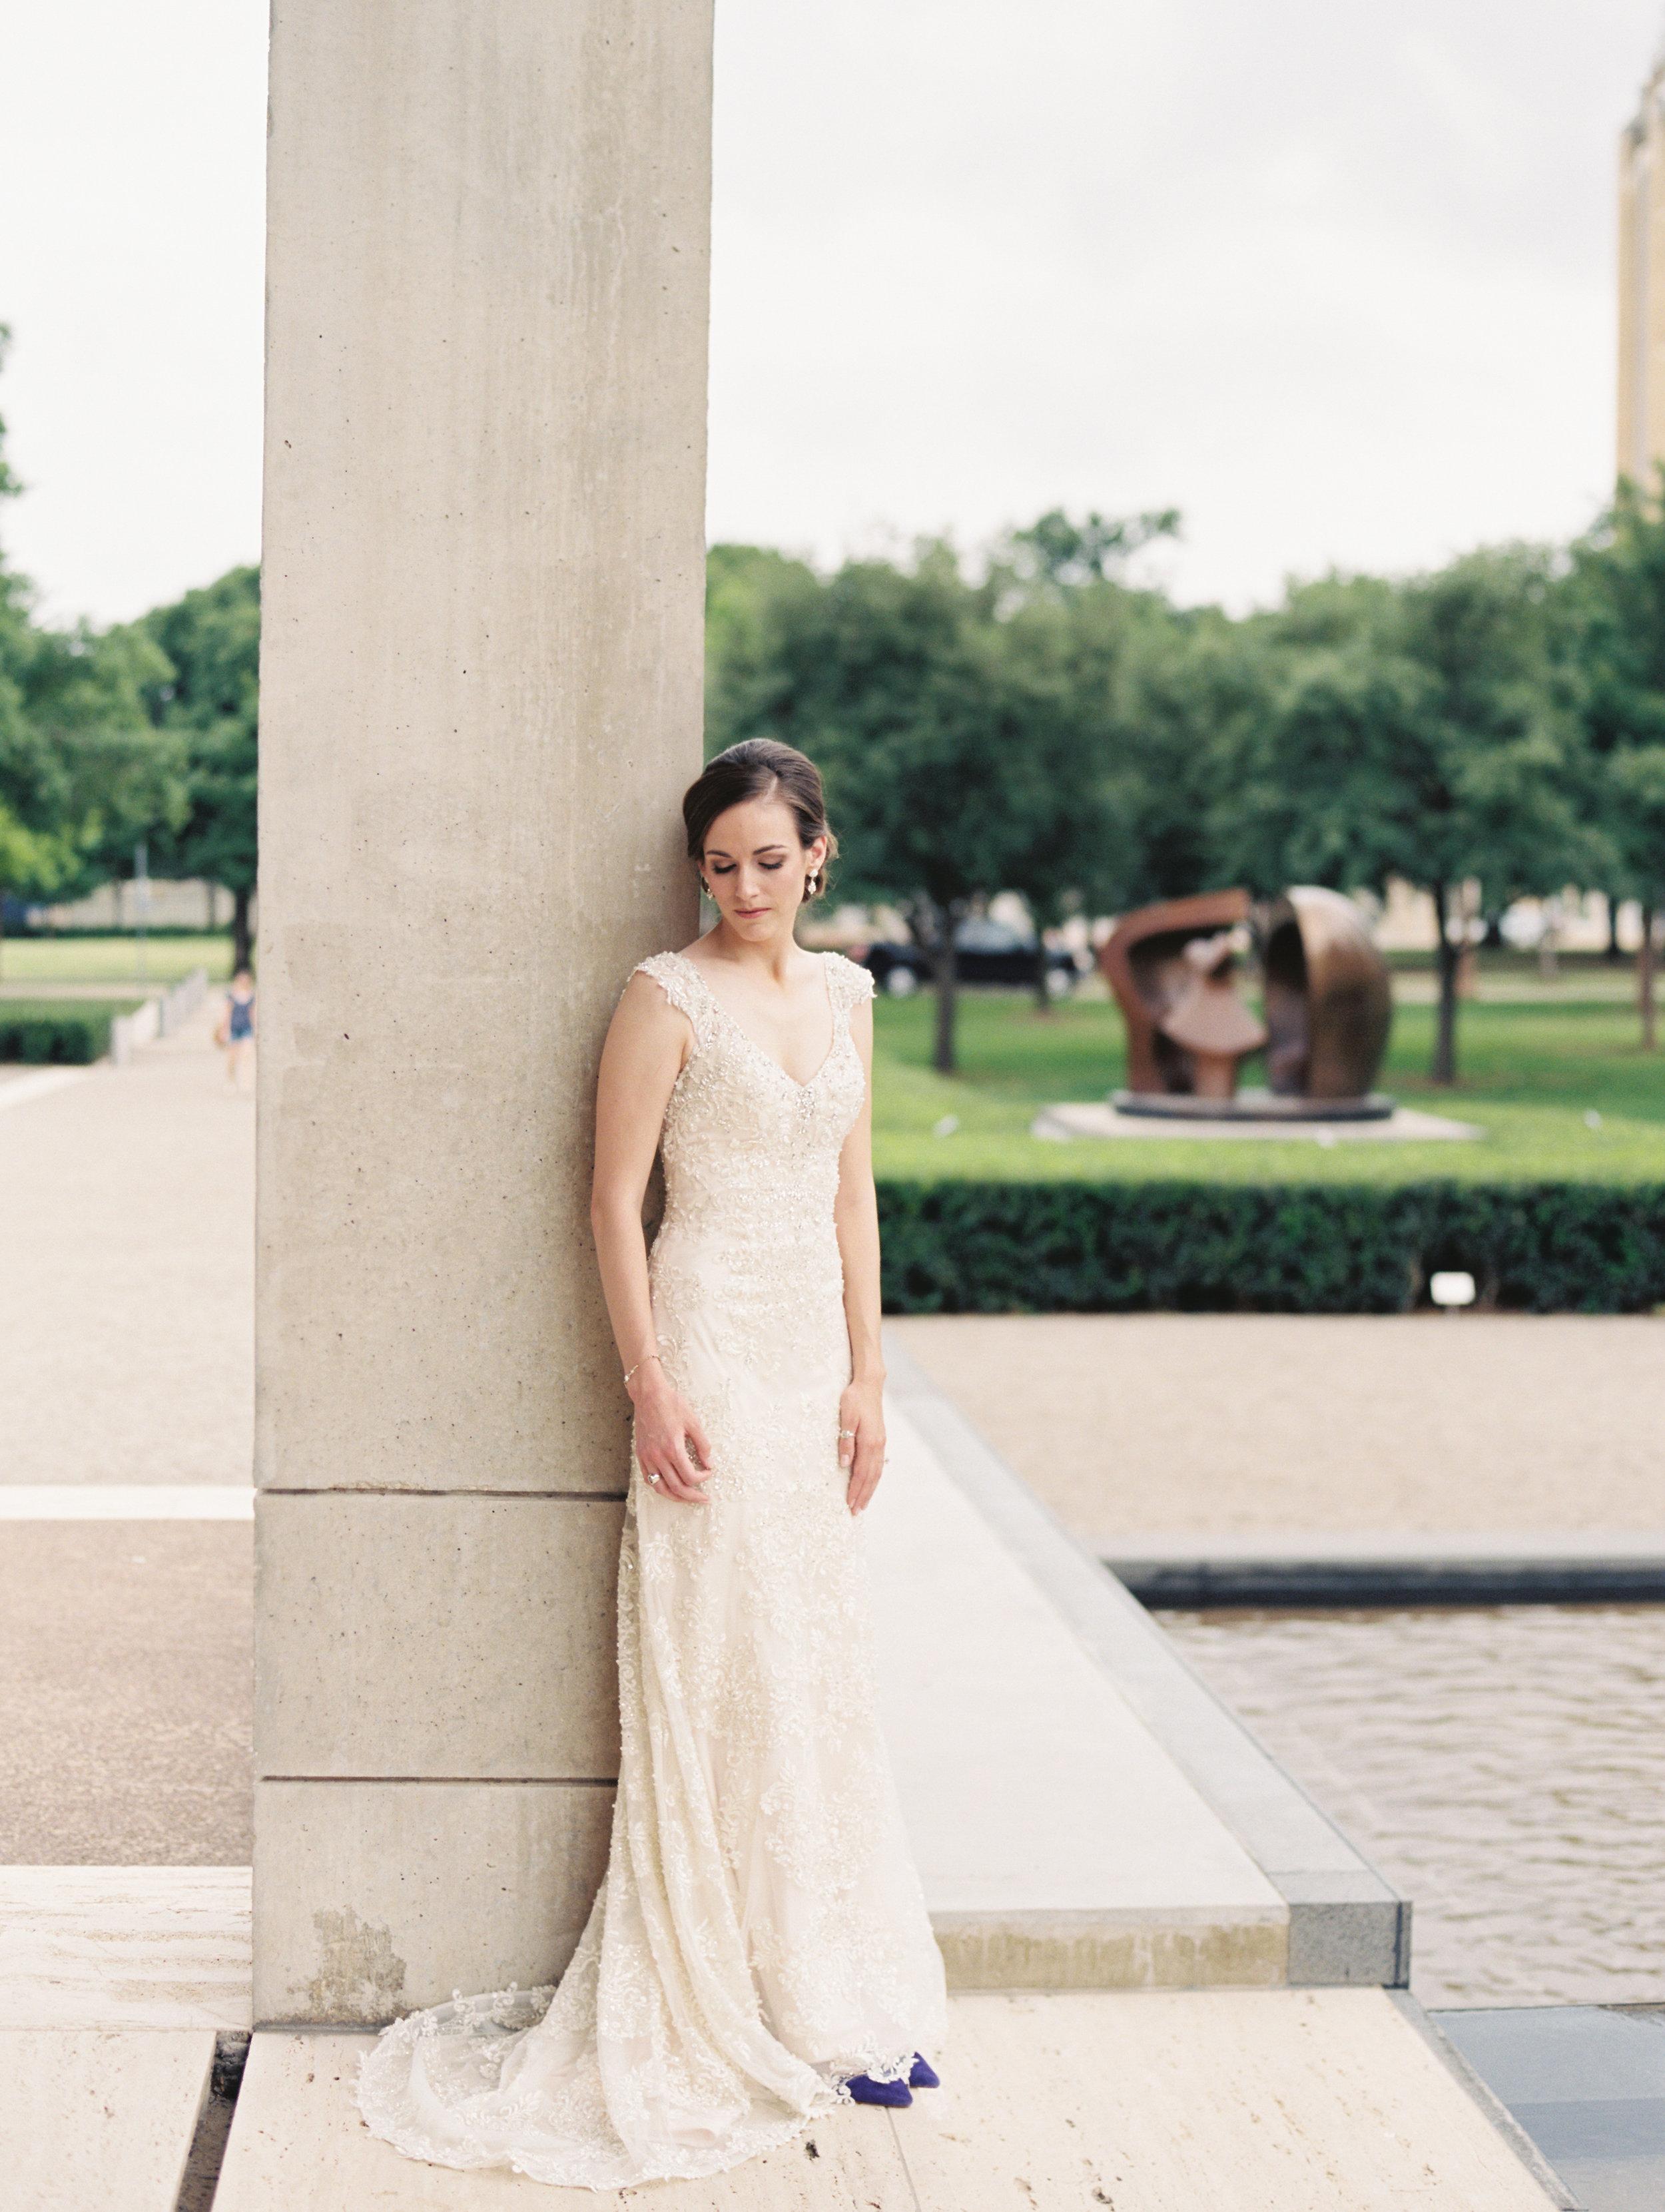 fort-worth-texas-kimbell-art-museum-bridals-ar-photography-lauren-221.jpg